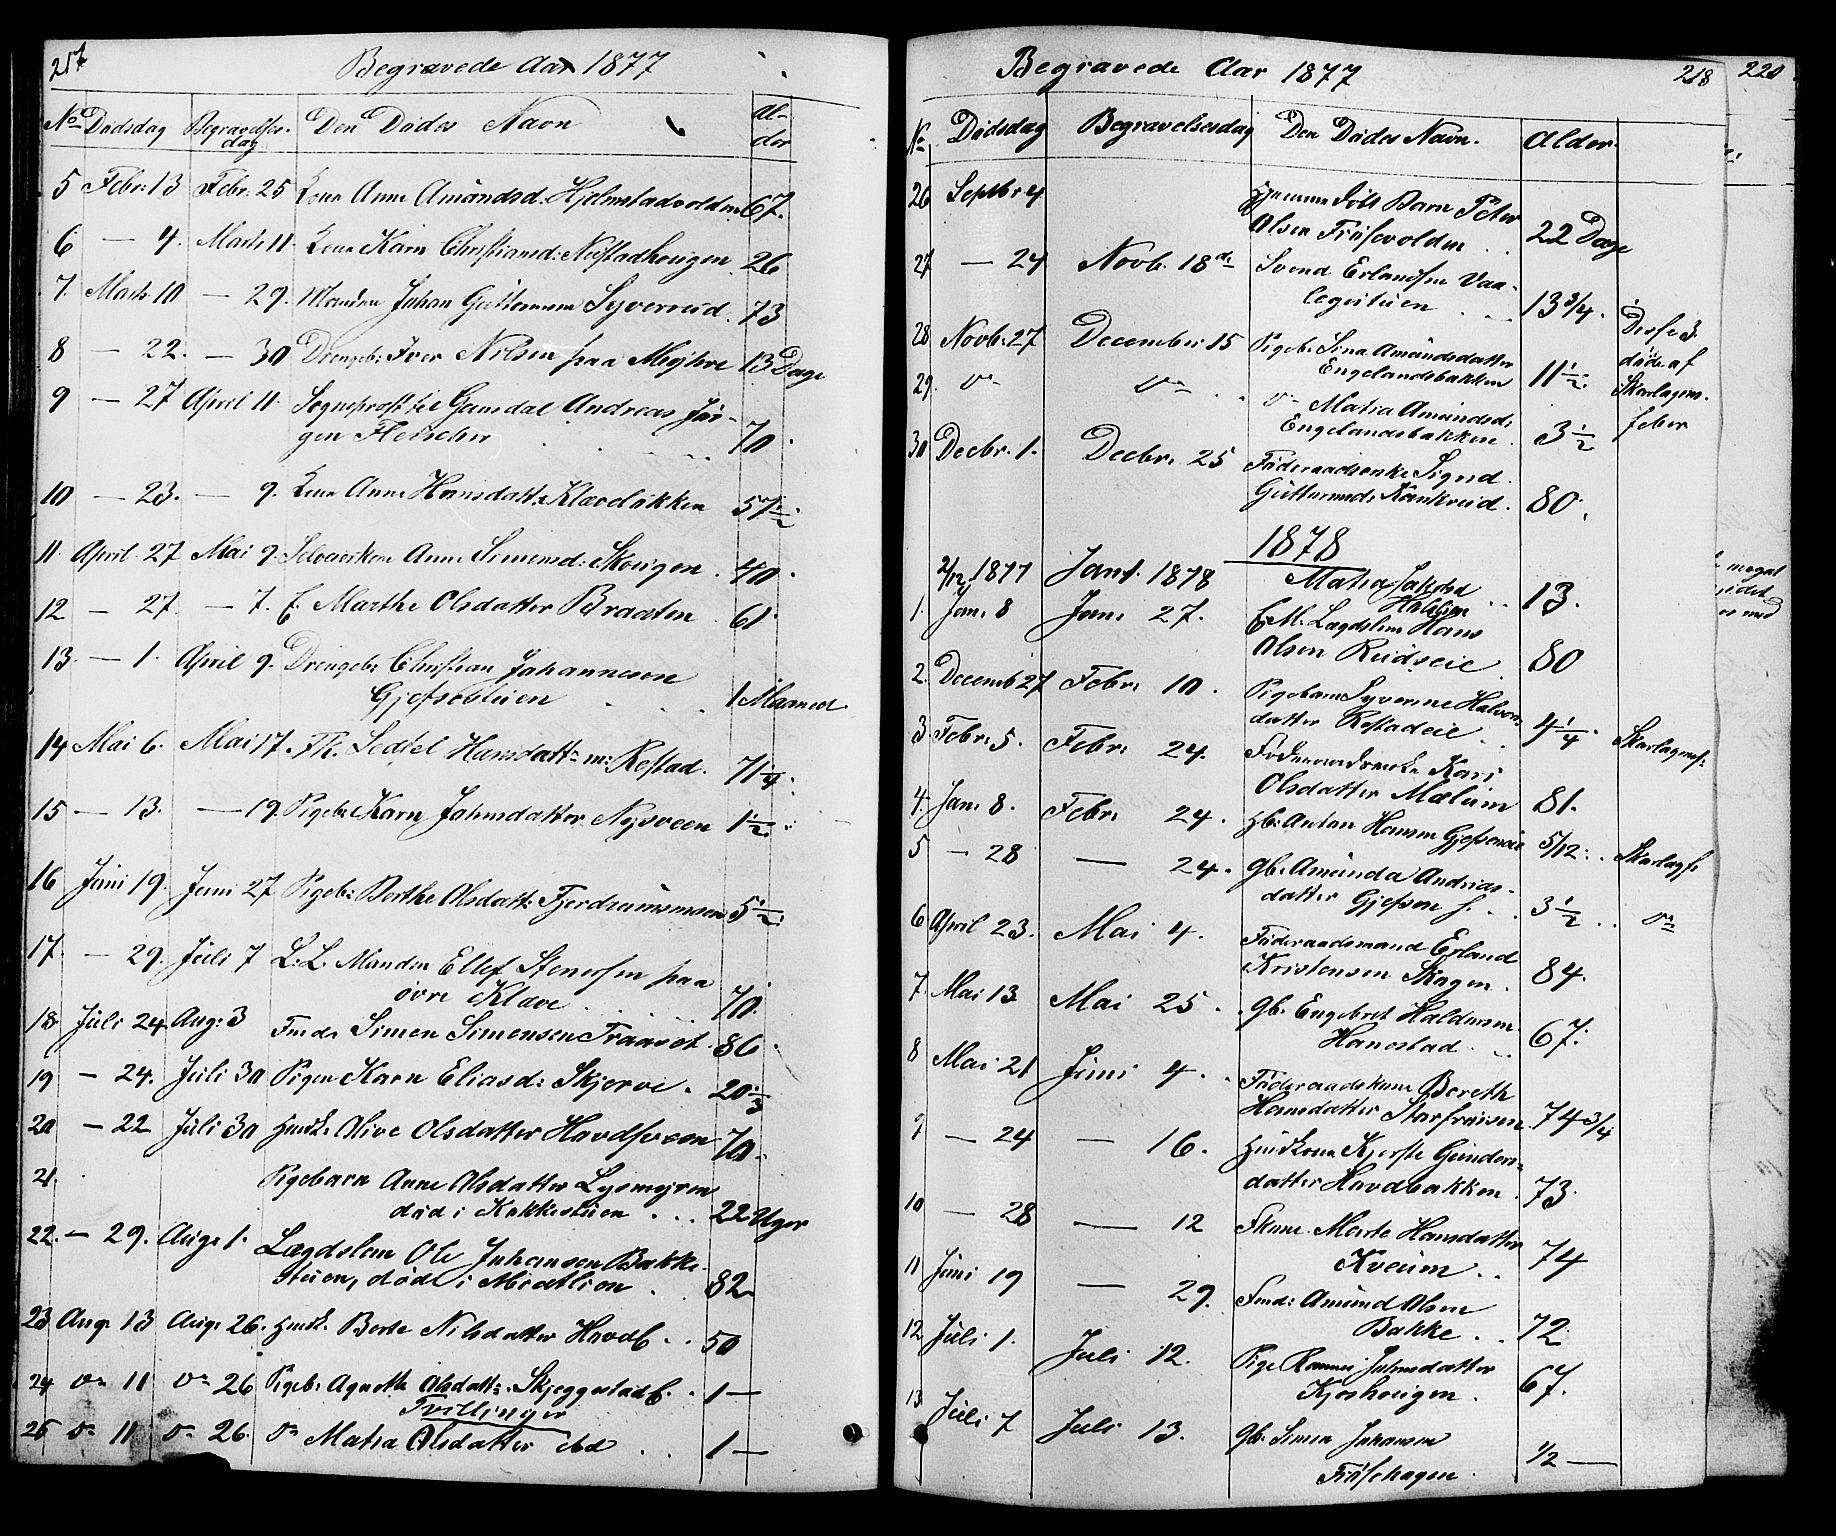 SAH, Østre Gausdal prestekontor, Klokkerbok nr. 1, 1863-1893, s. 217-218